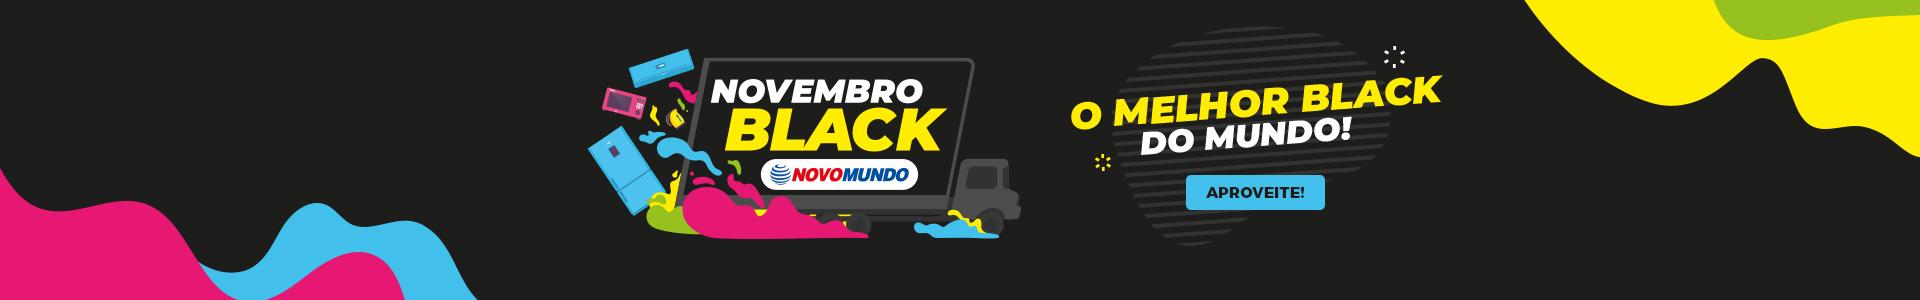 NOVEMBRO BLACK | CAPA